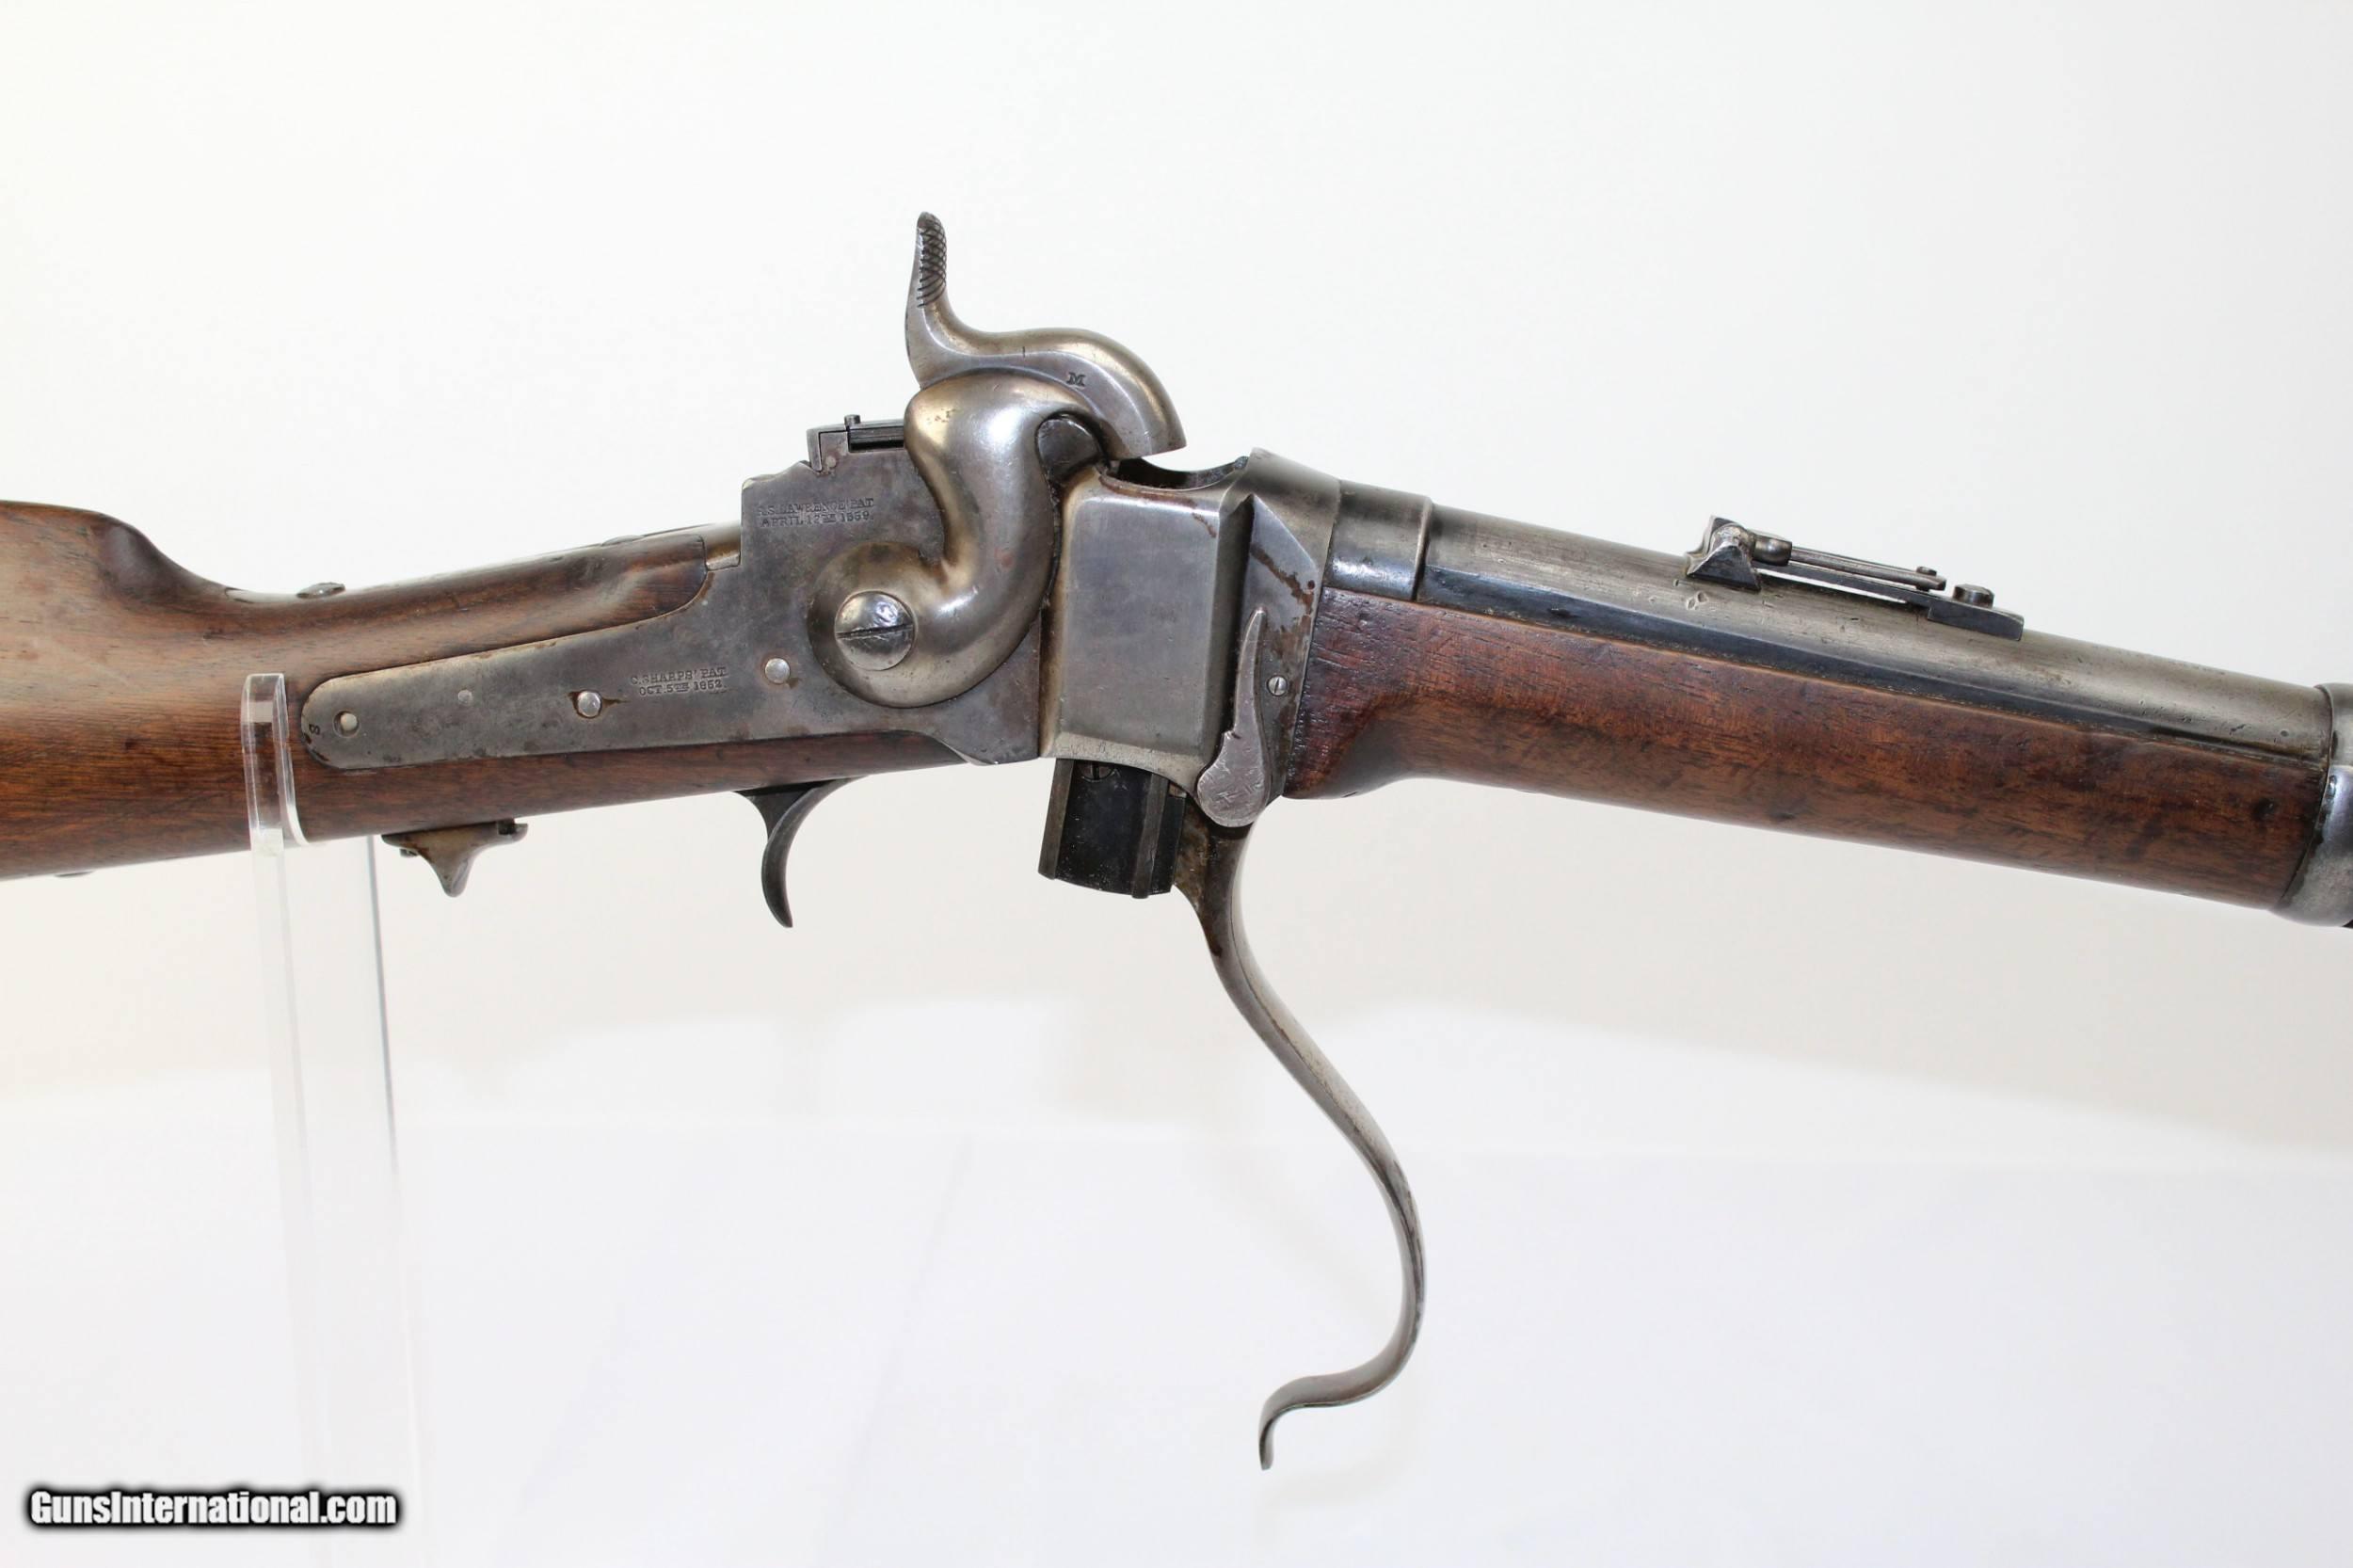 CIVIL WAR Antique SHARPS New Model 1863 CARBINE